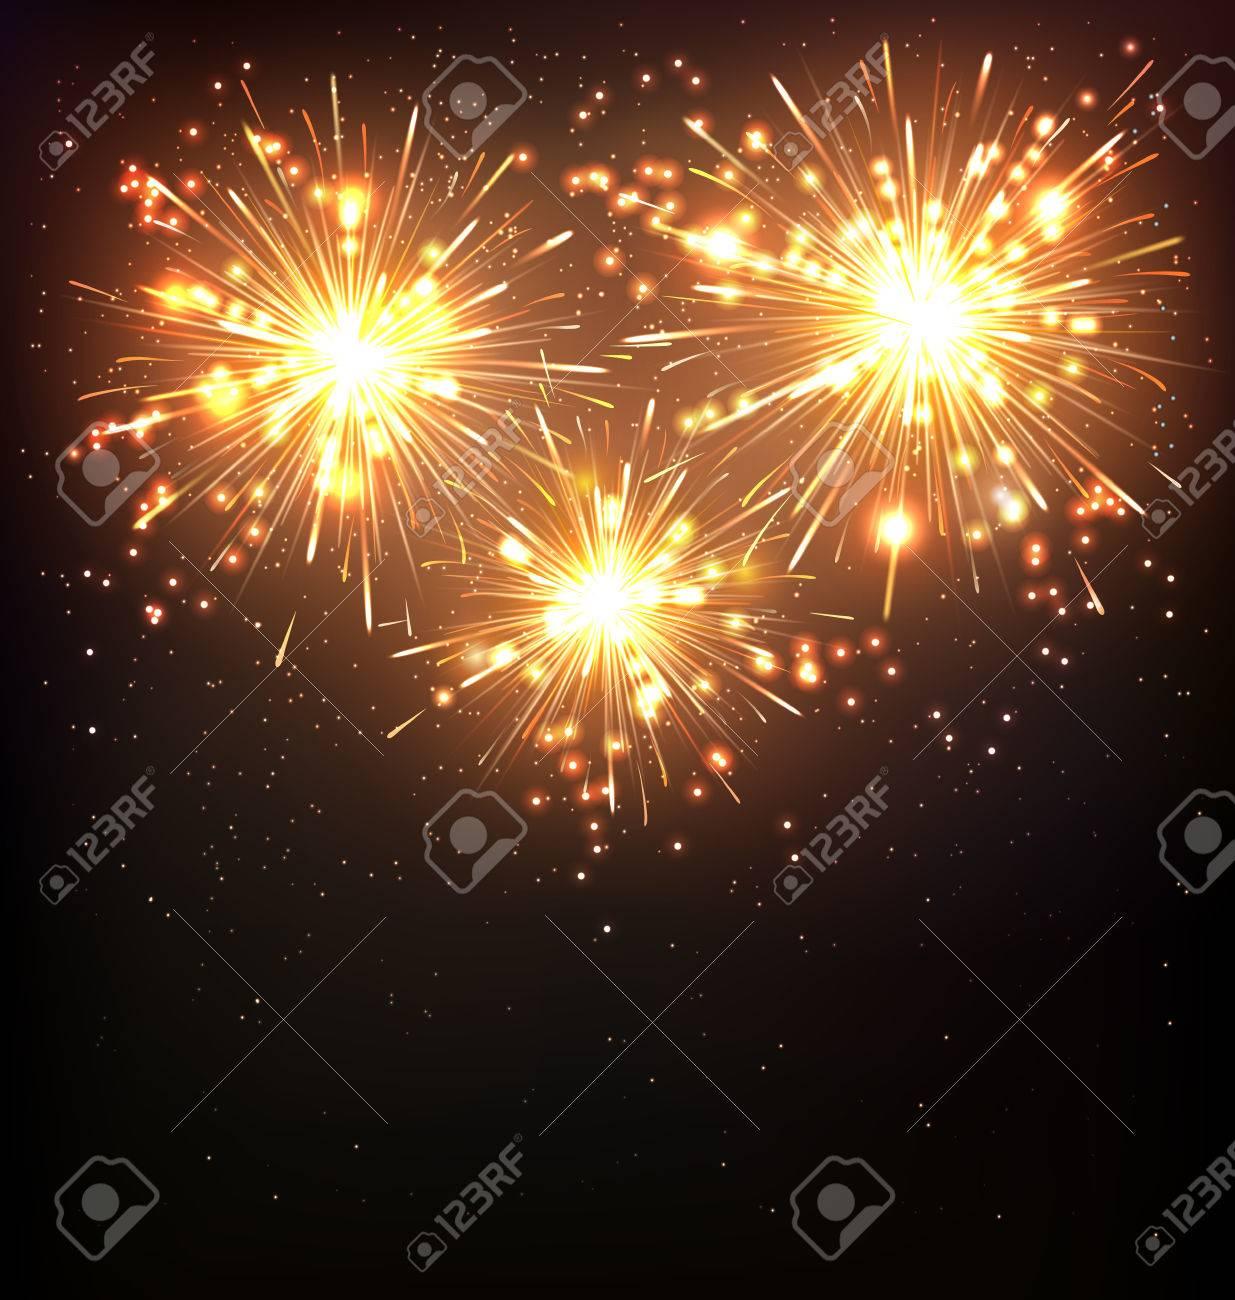 Festive Firework Salute Burst on Black Background - 47163492